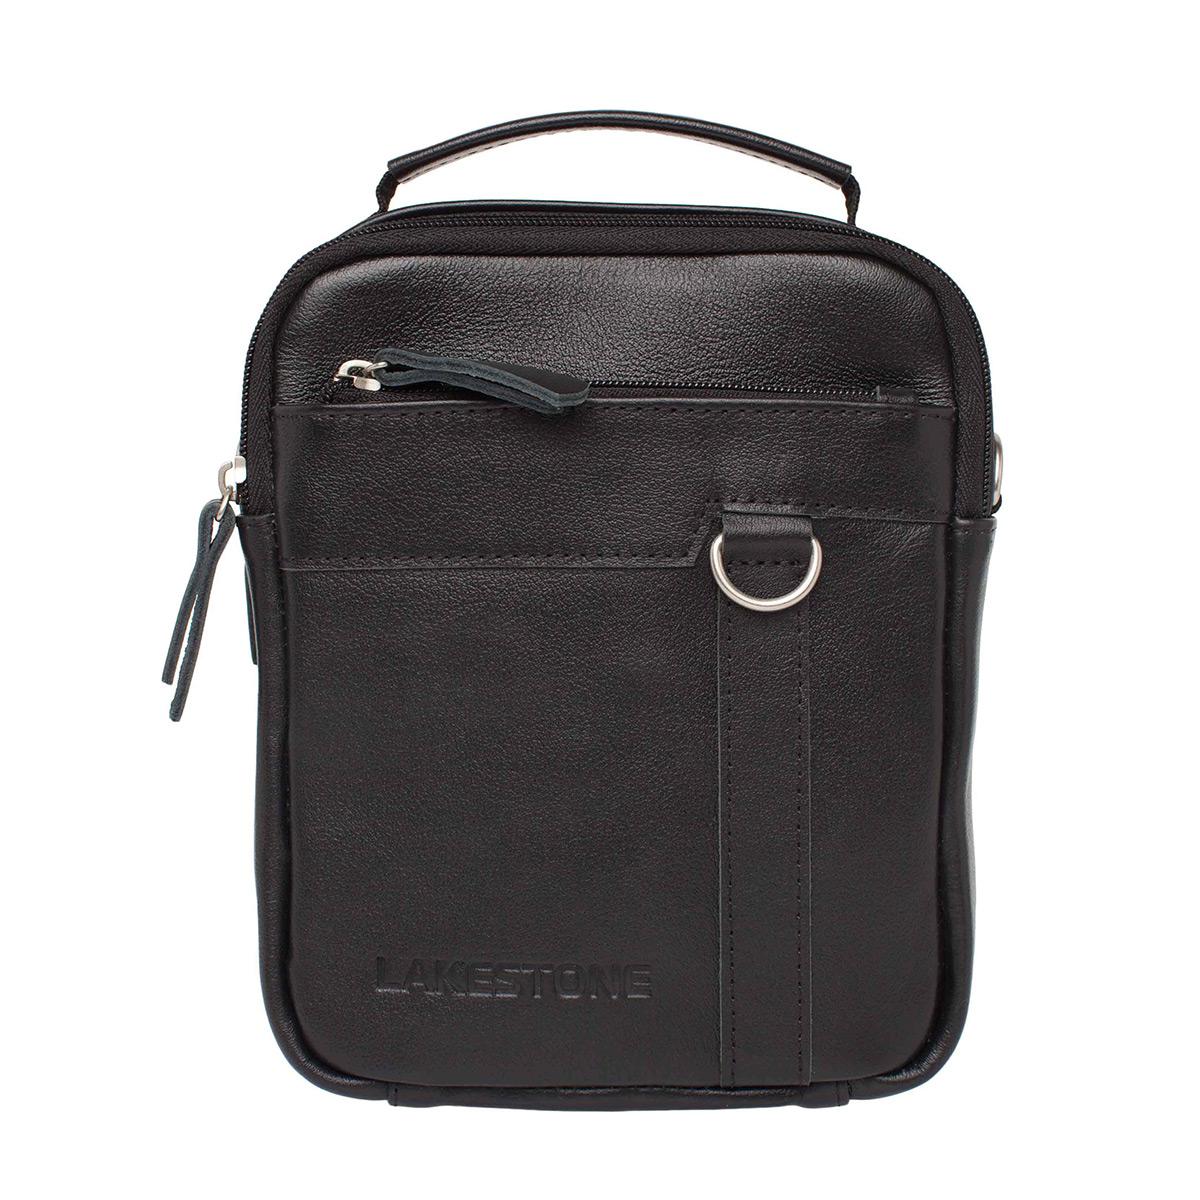 Мужская кожаная сумка через плечо Drake Black фото